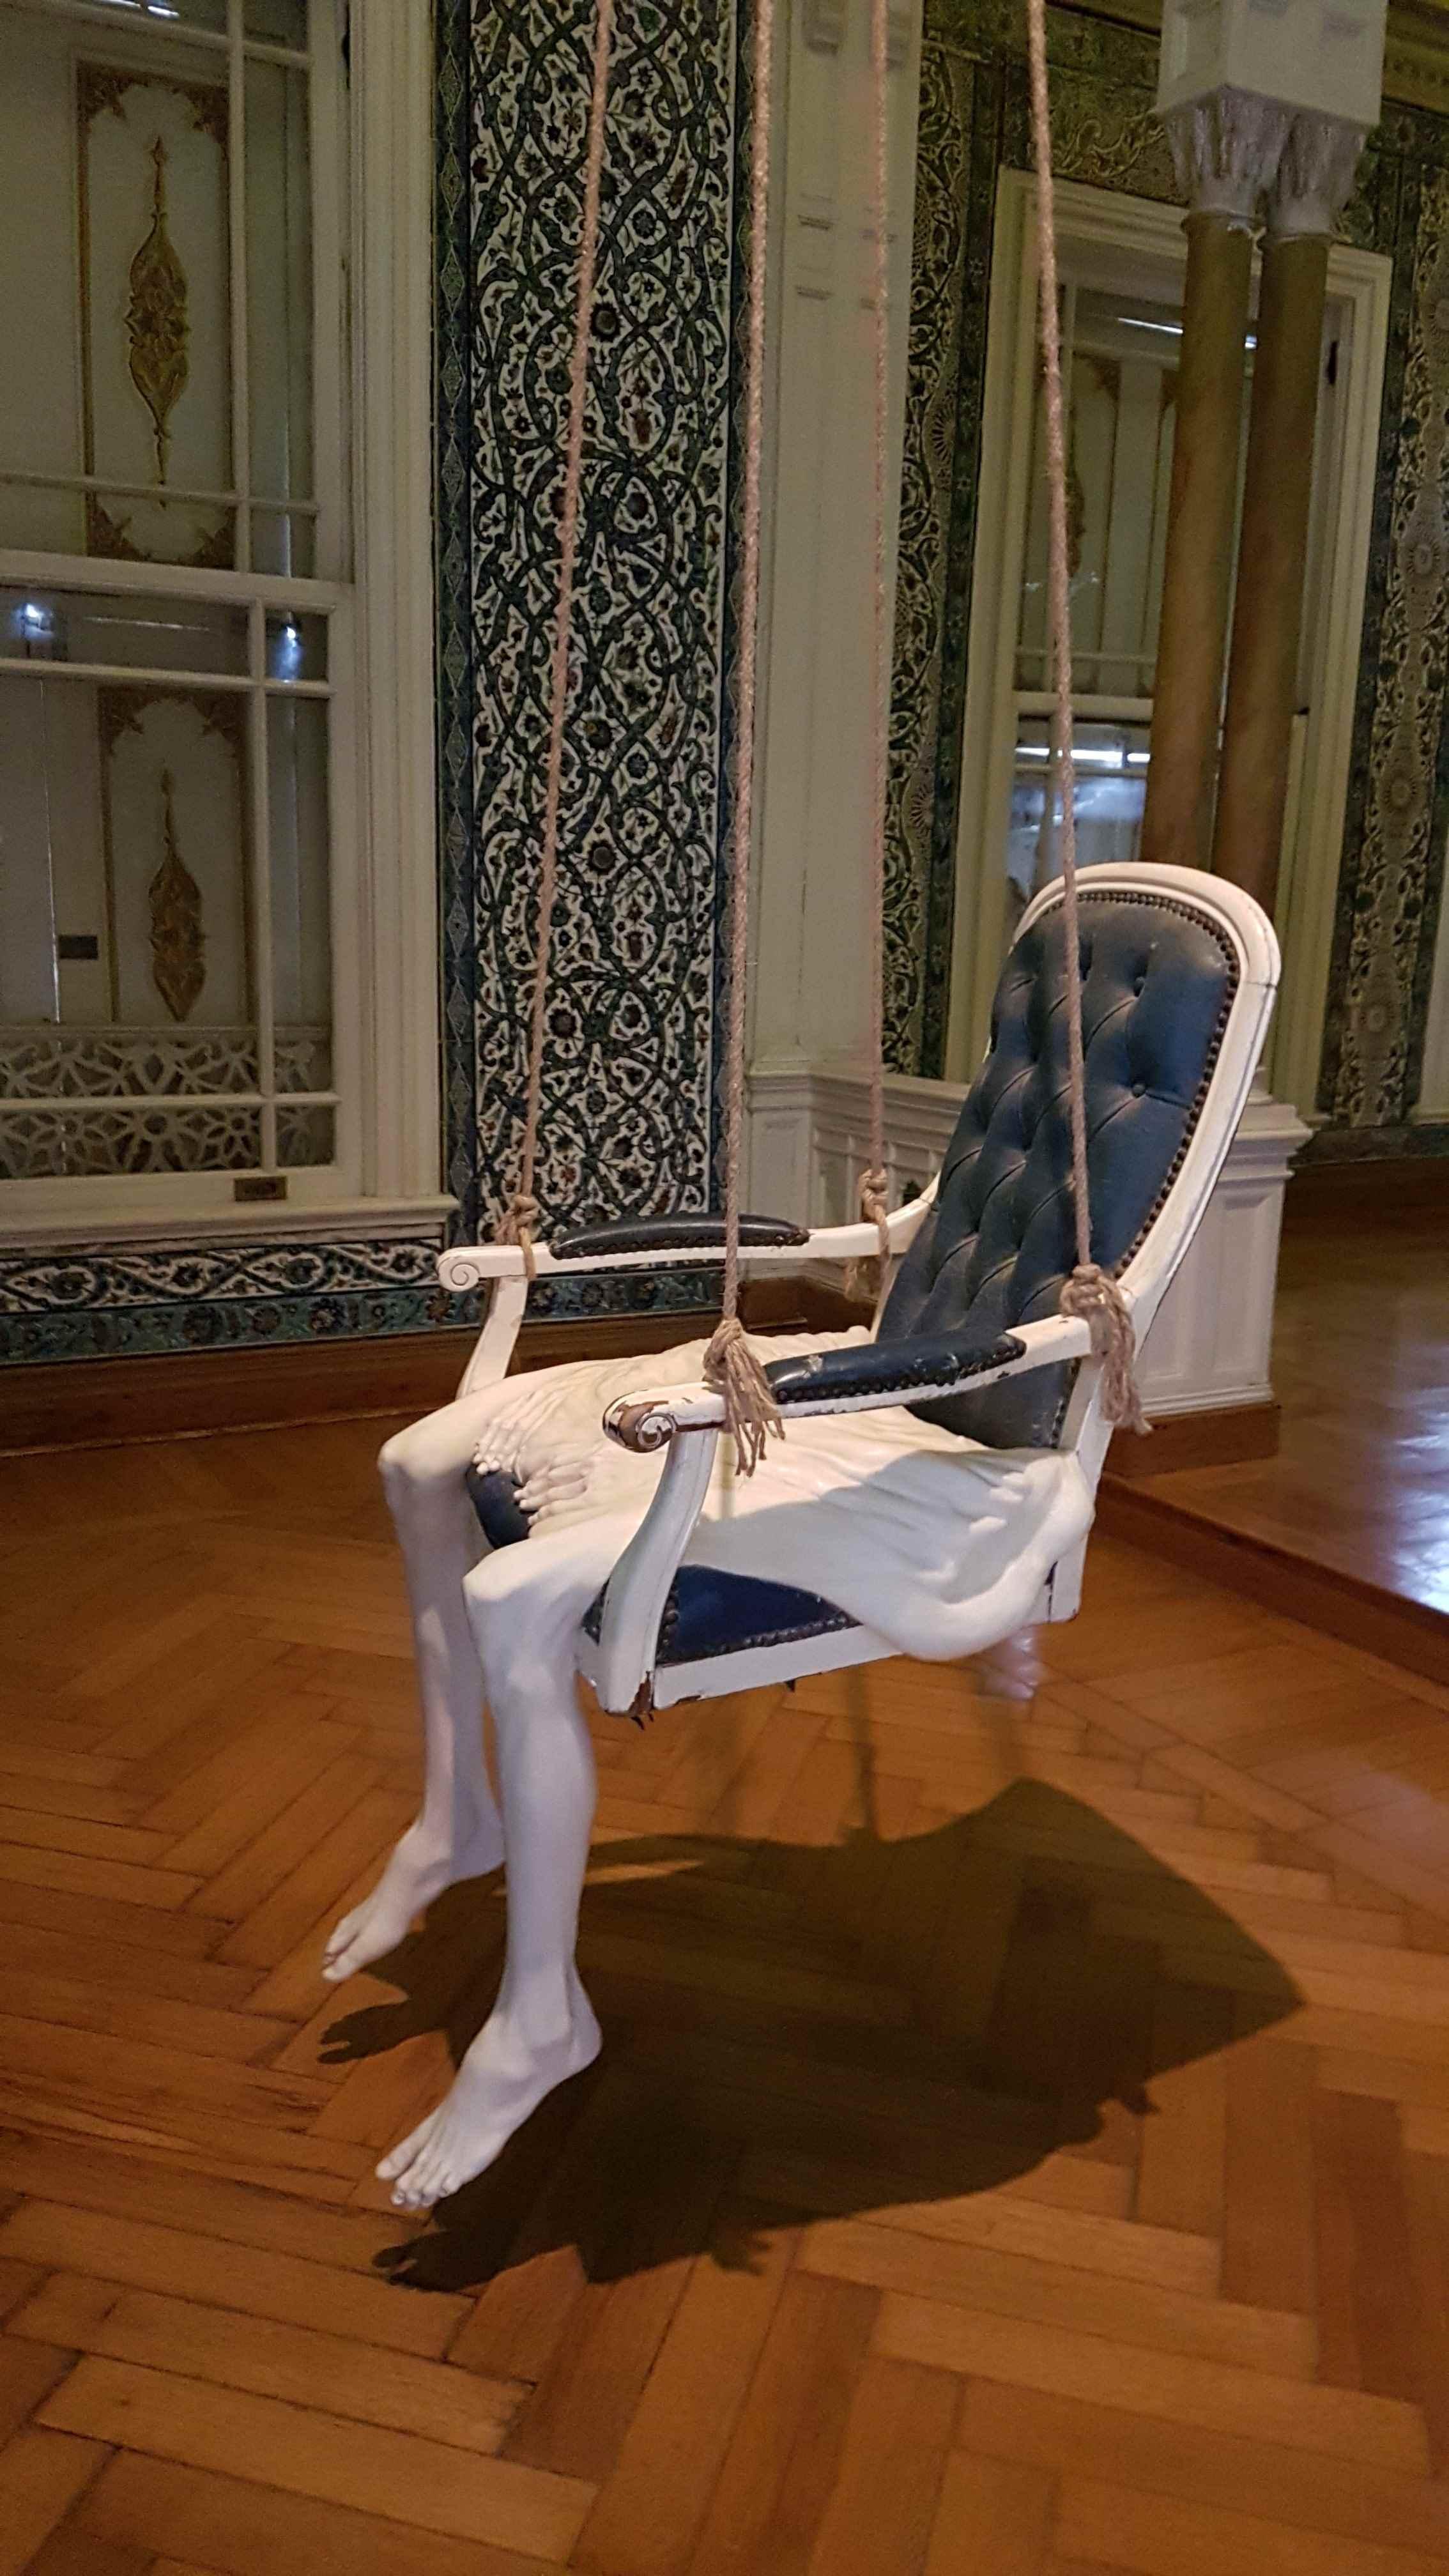 yesempatik-abdulmecid-efendi-kosku-kapi-calana-acilir-bieanal-sandalye